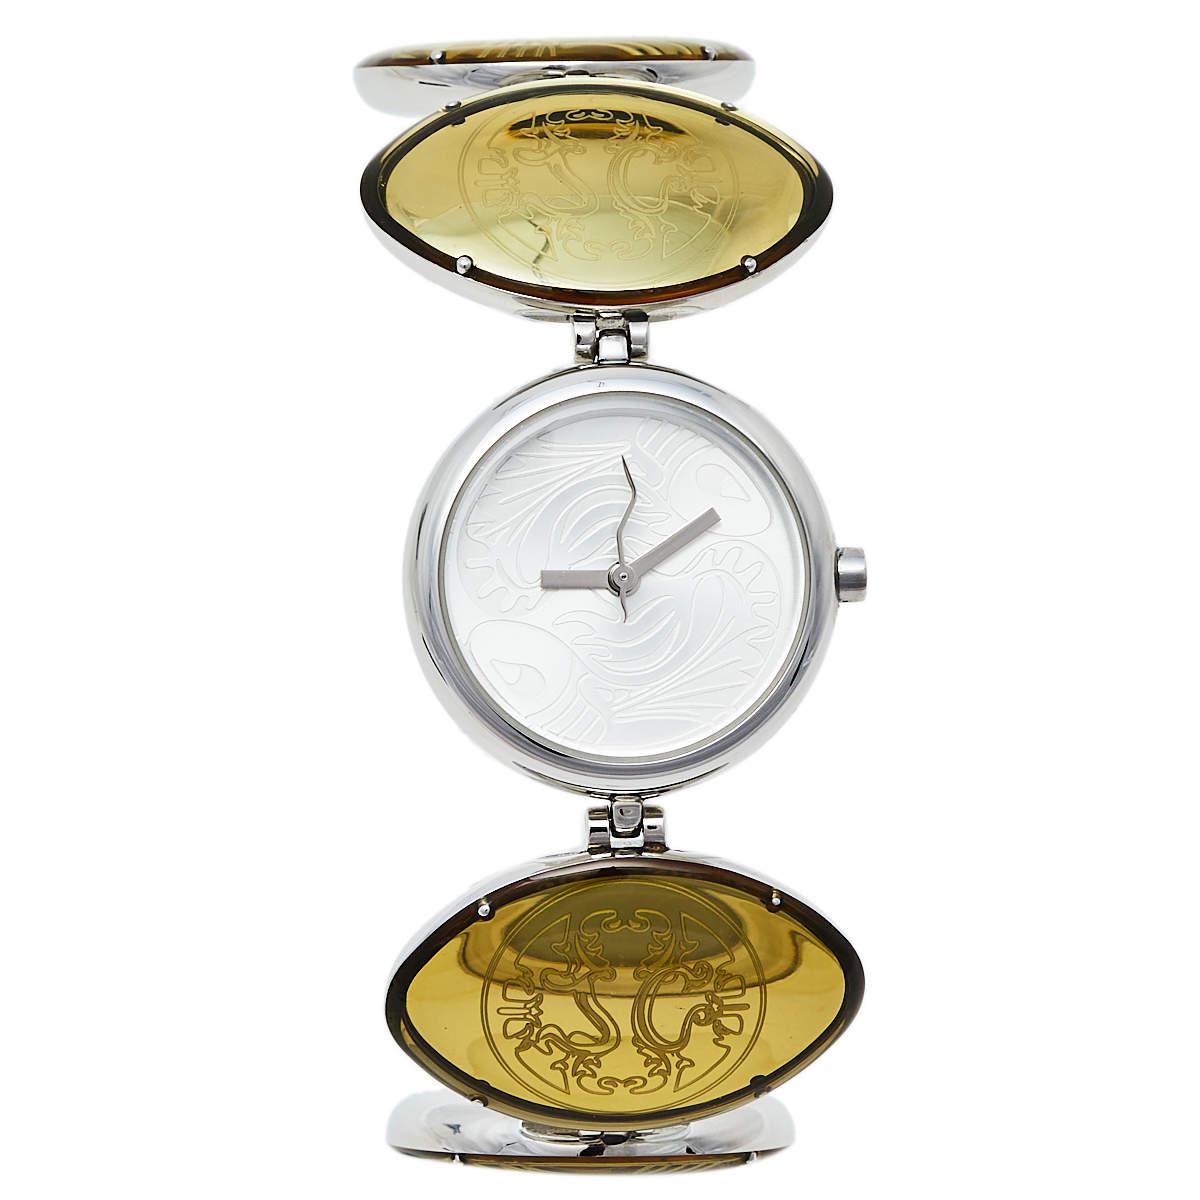 Just Cavalli Silver Stainless Steel Cina 7253785035 Women's Wristwatch 27 mm